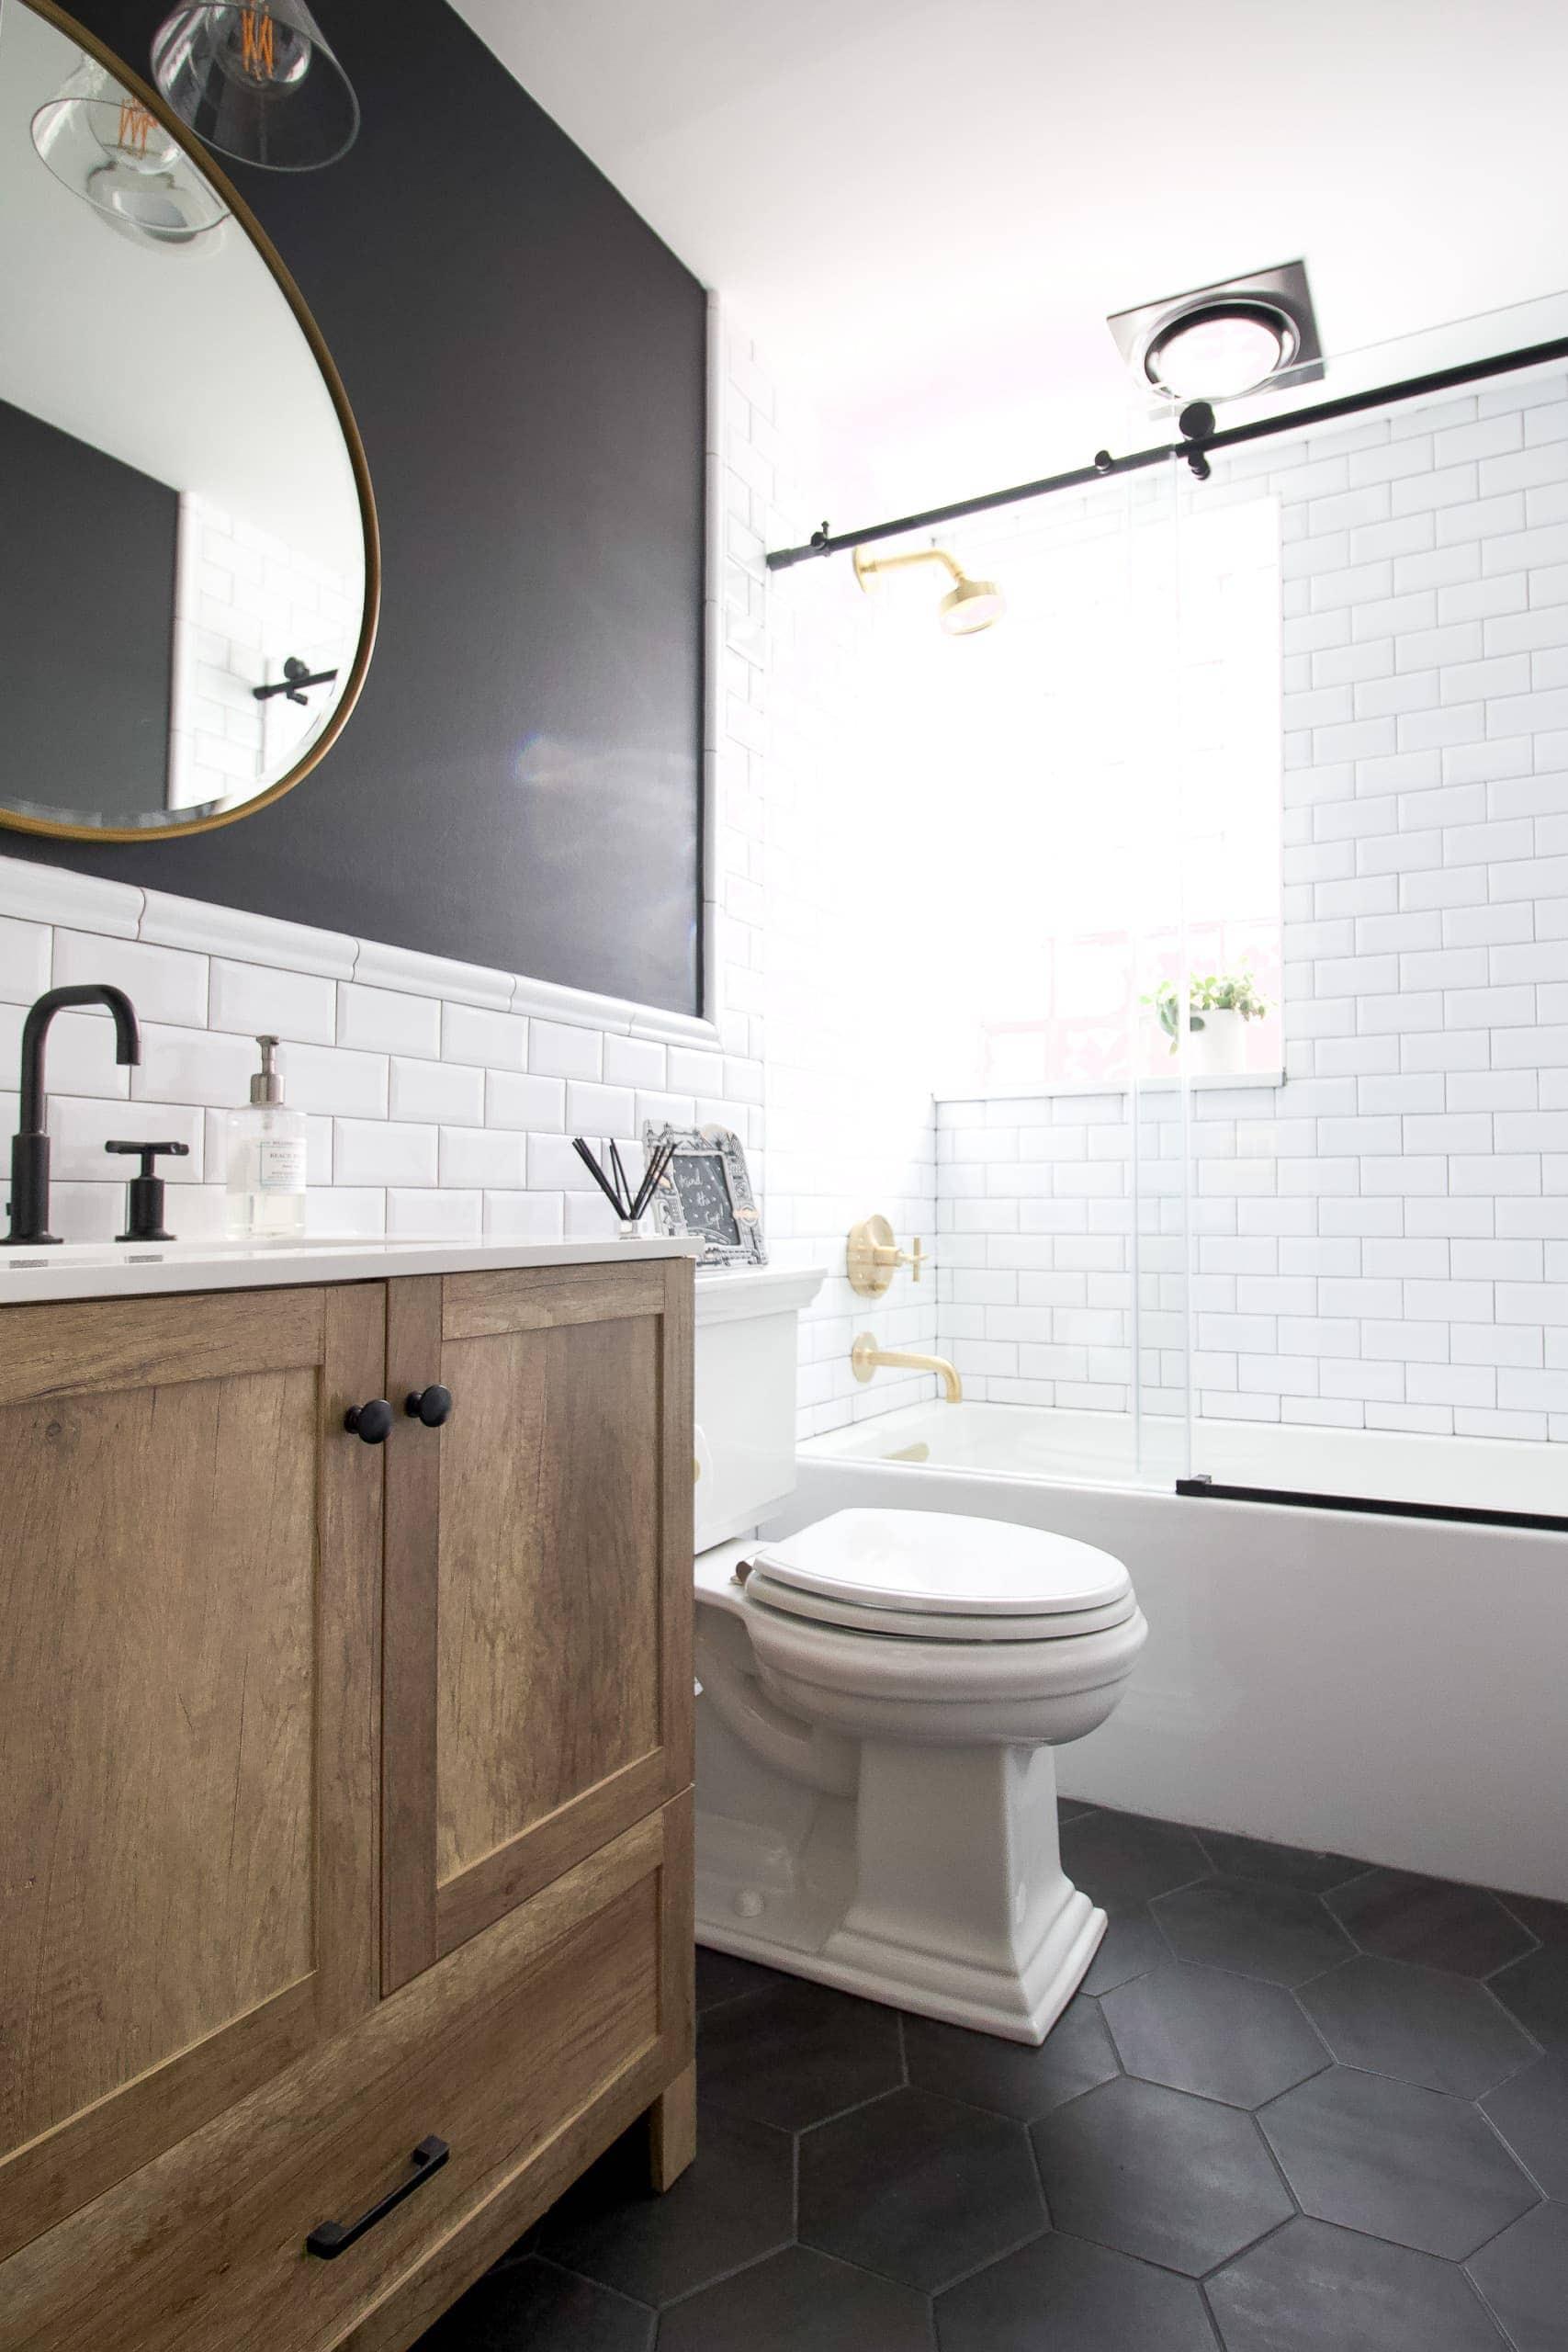 Liz's black and white bathroom